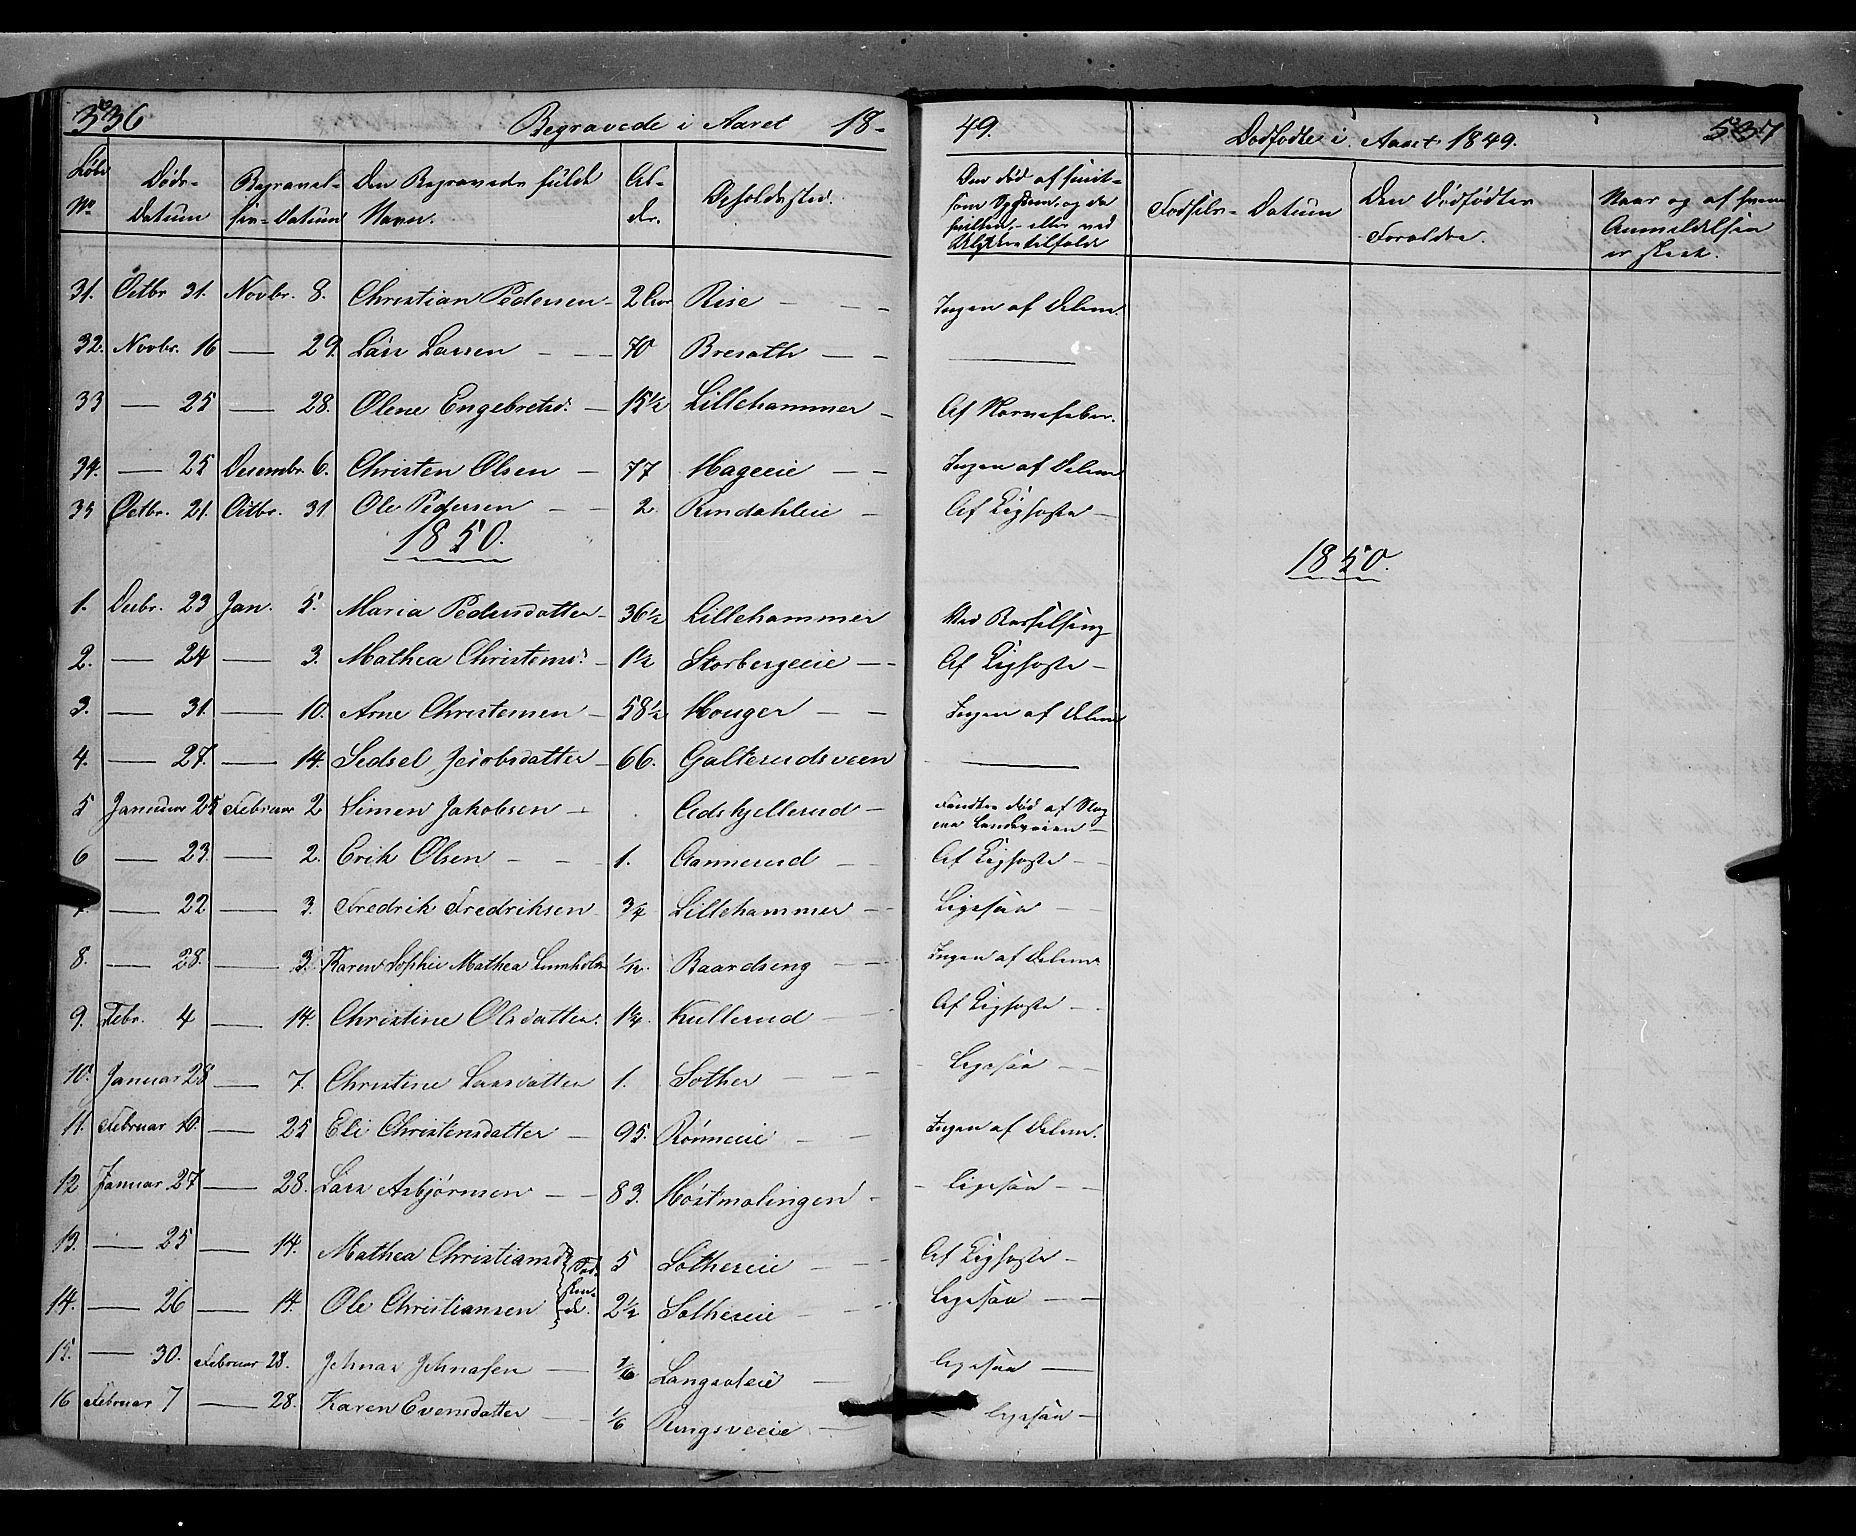 SAH, Fåberg prestekontor, Klokkerbok nr. 6, 1837-1855, s. 536-537